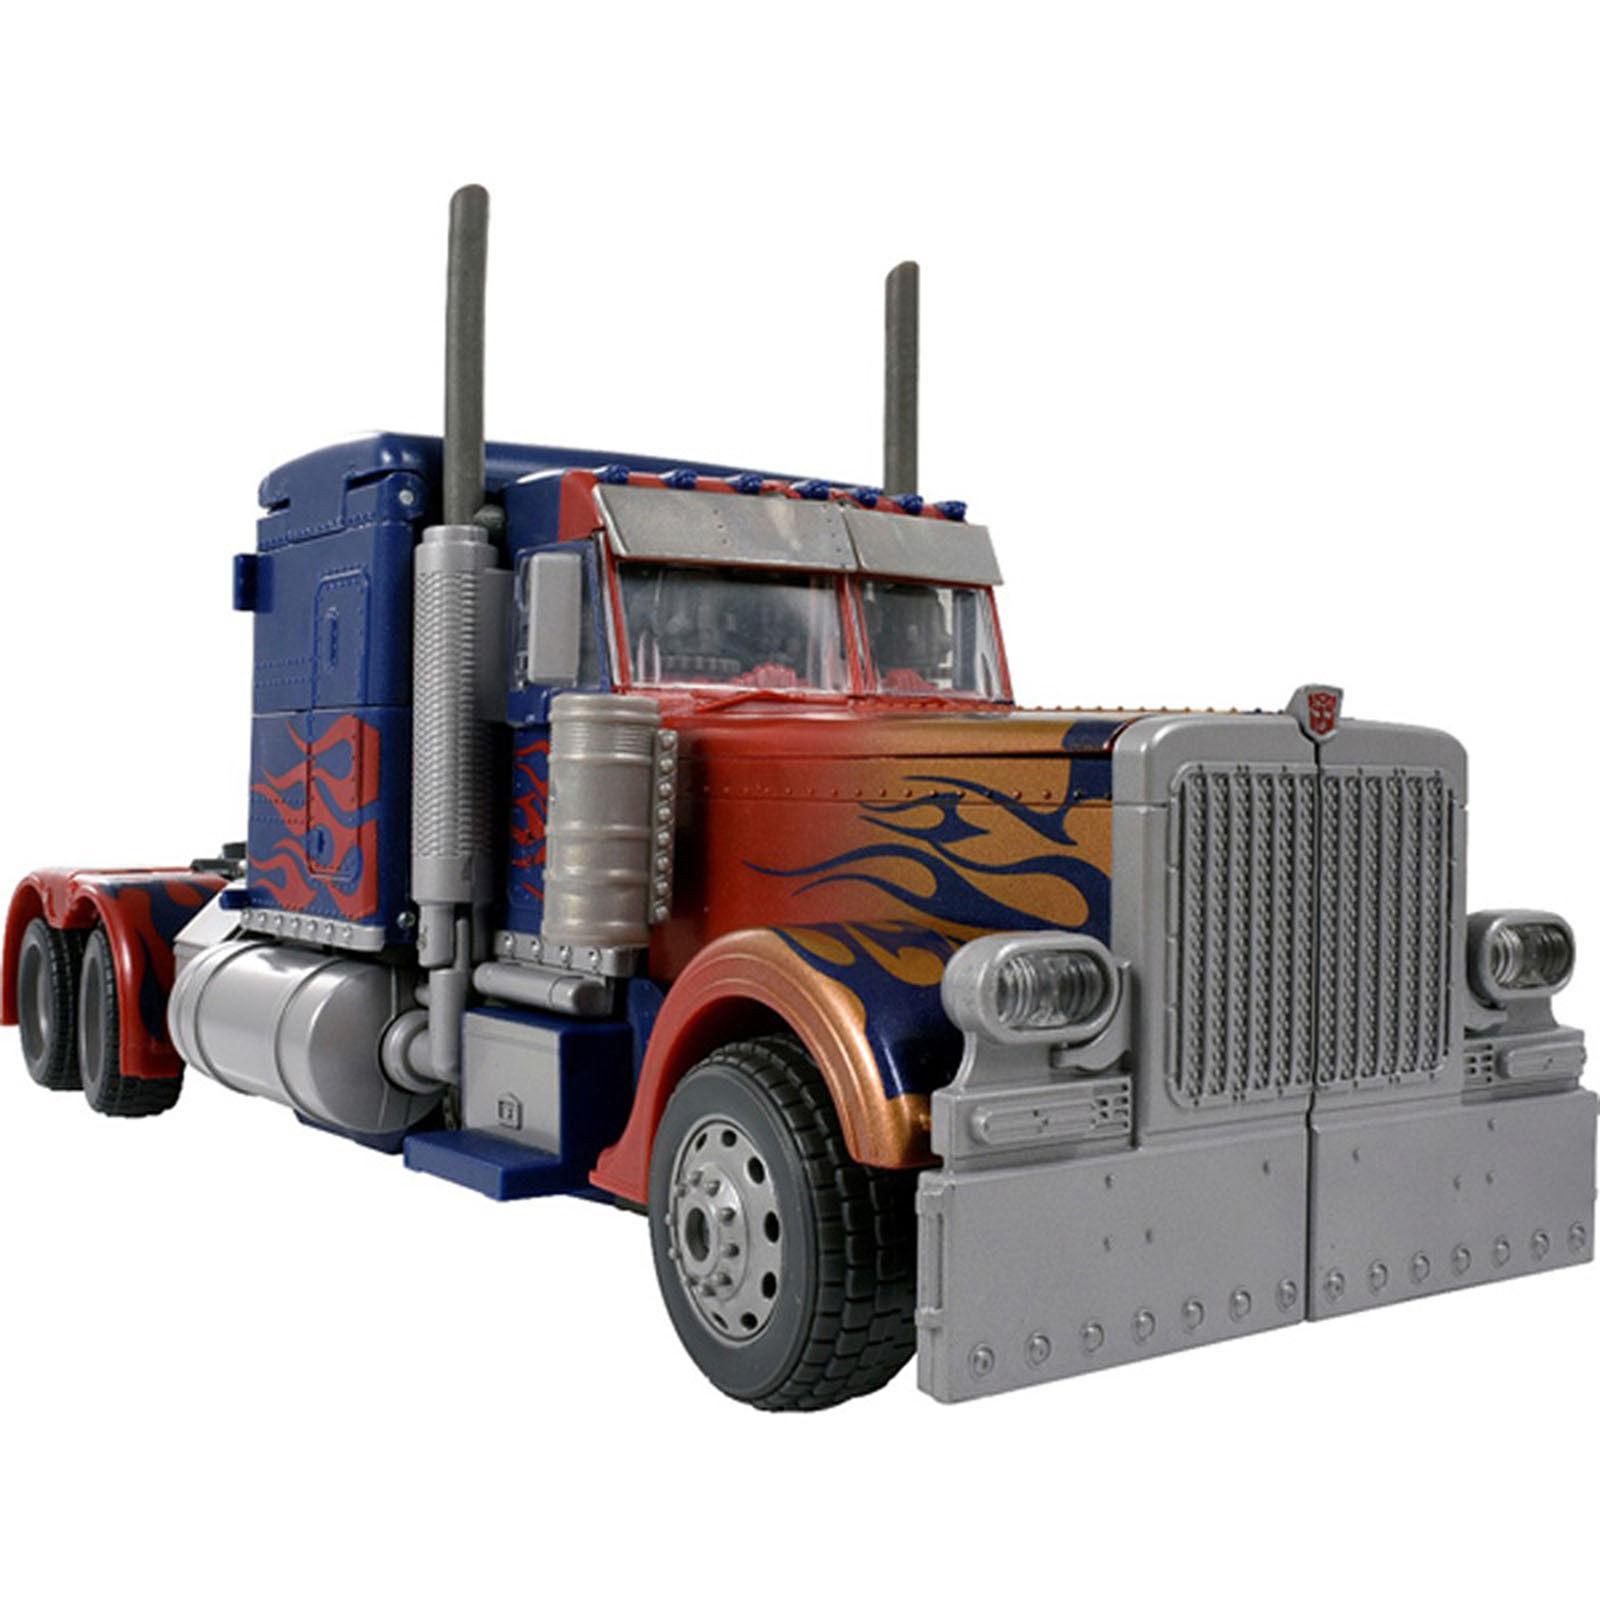 Transformers Movie the Best MB-17 Optimus Prime REVENGE Christmas Gift